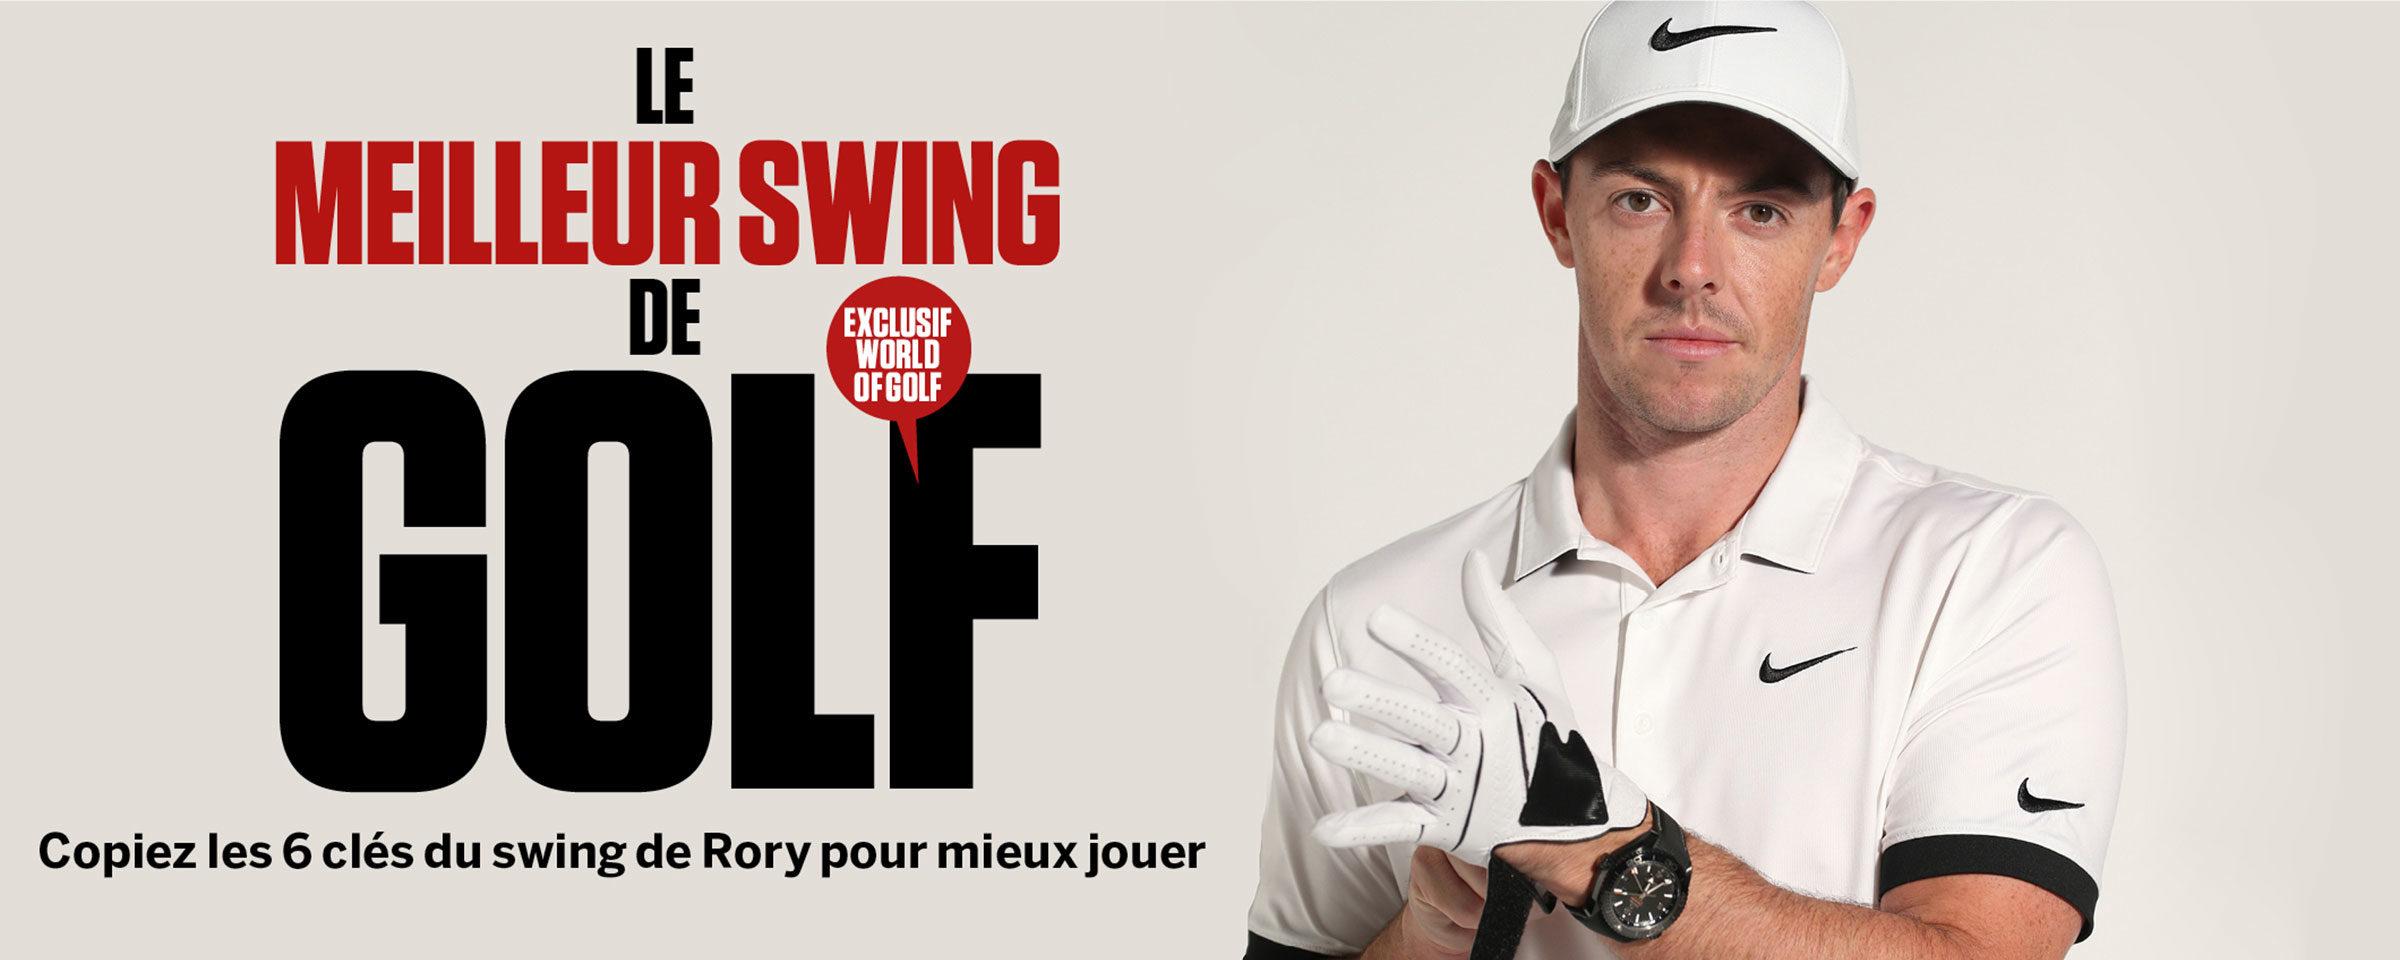 Rory McIlroy – Le meilleur swing de golf